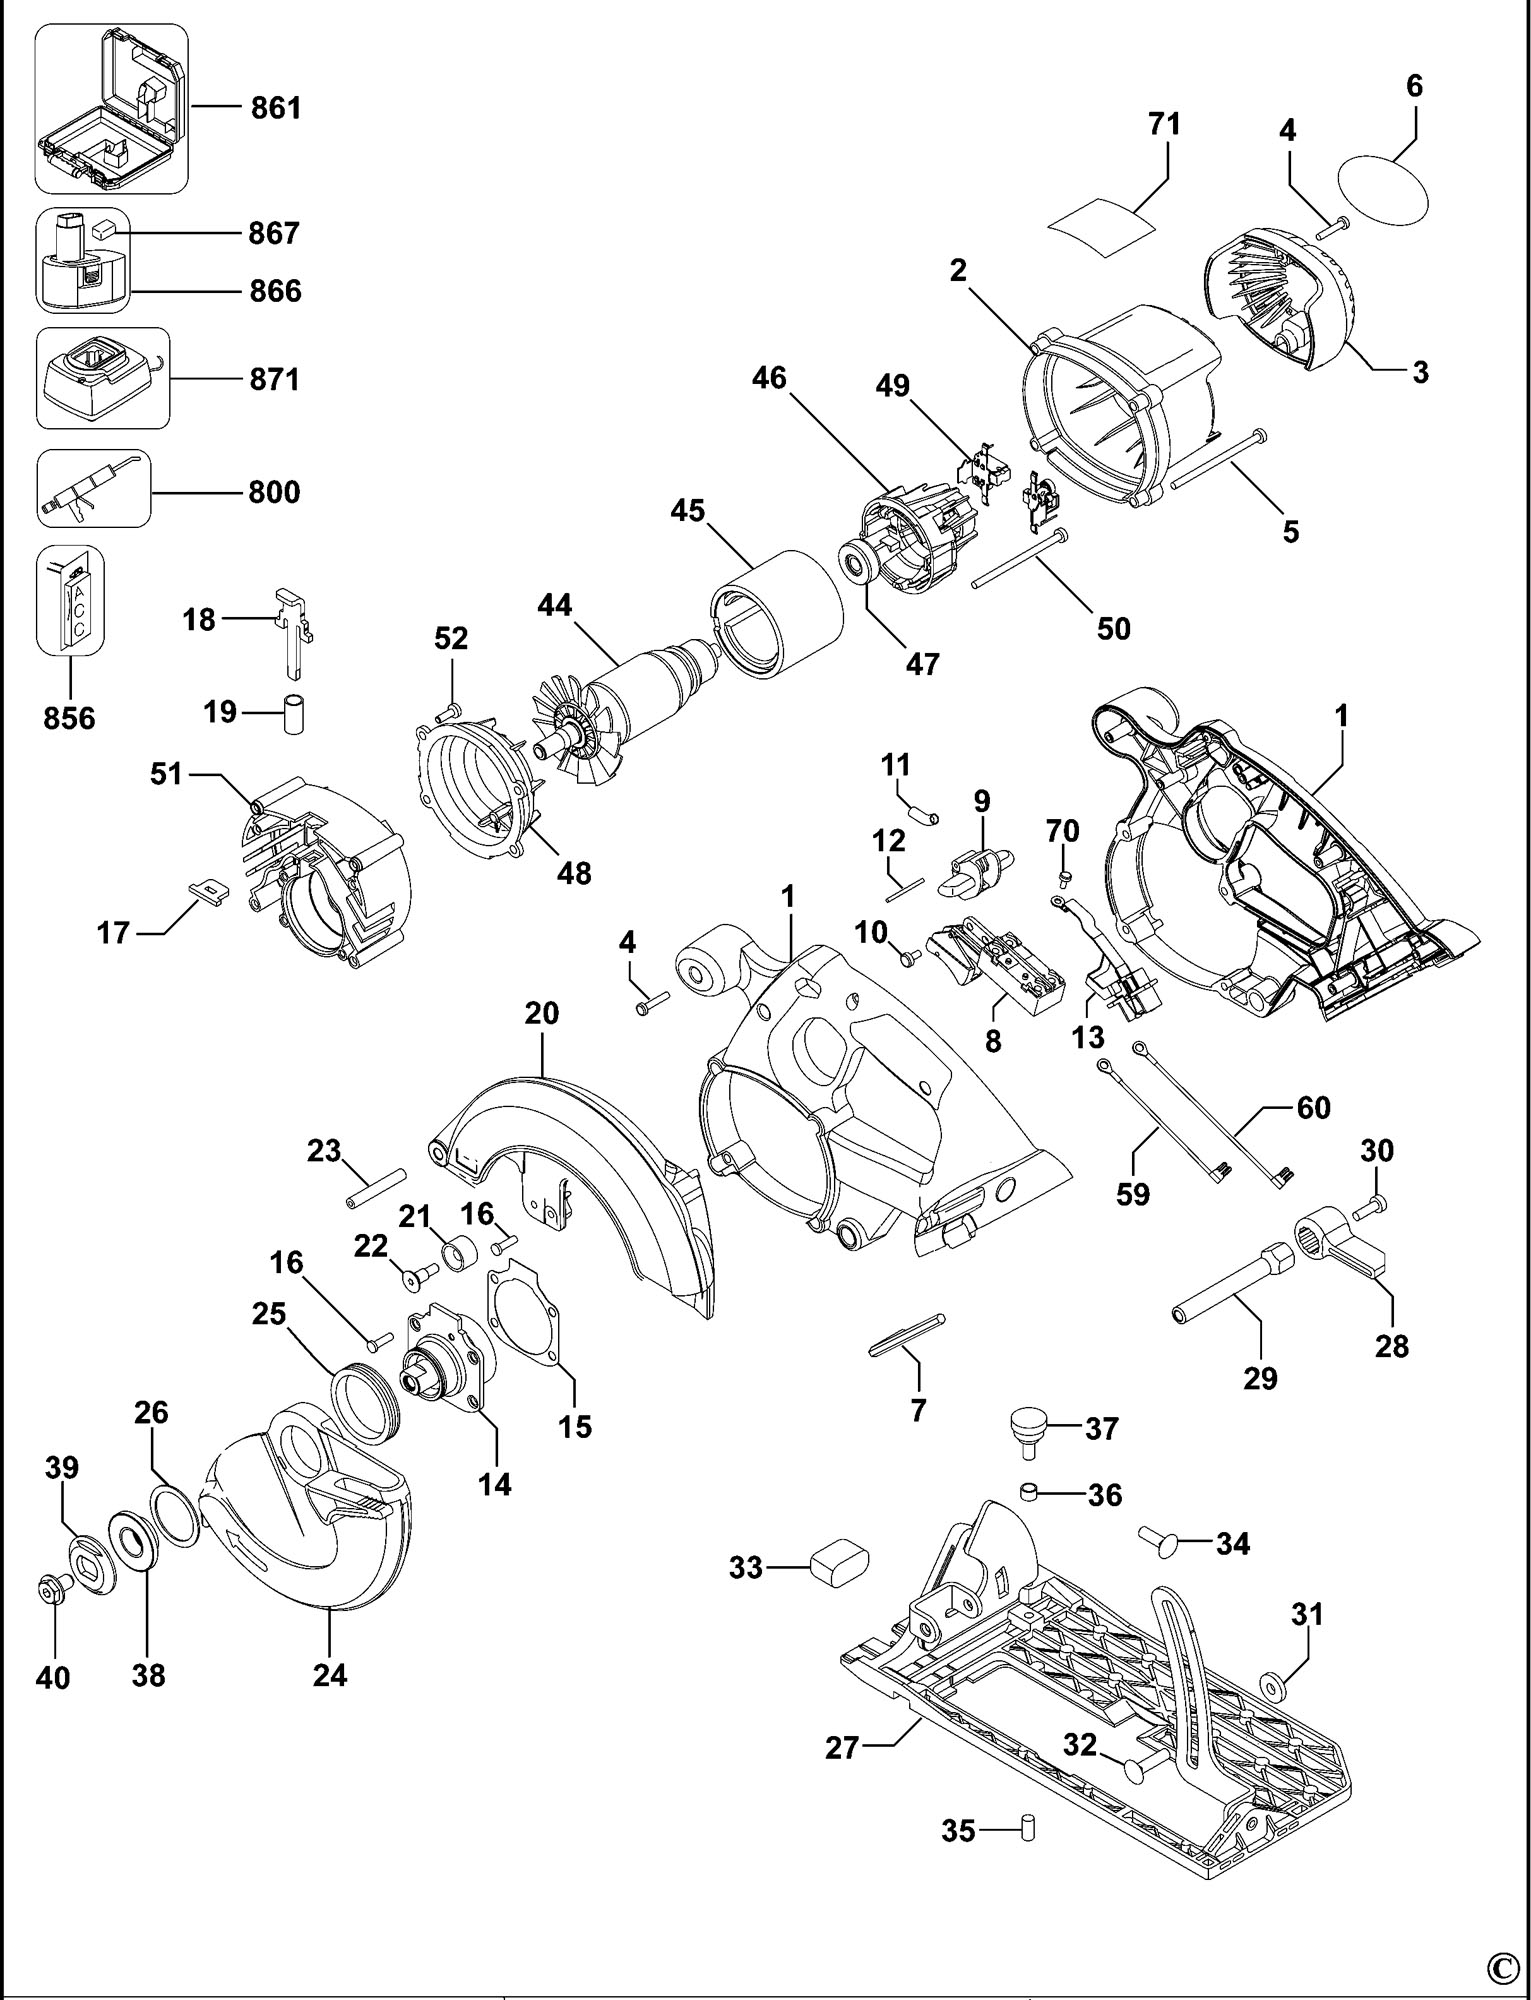 Spares For Dewalt Dc390k Cordless Circular Saw Type 1 Xe